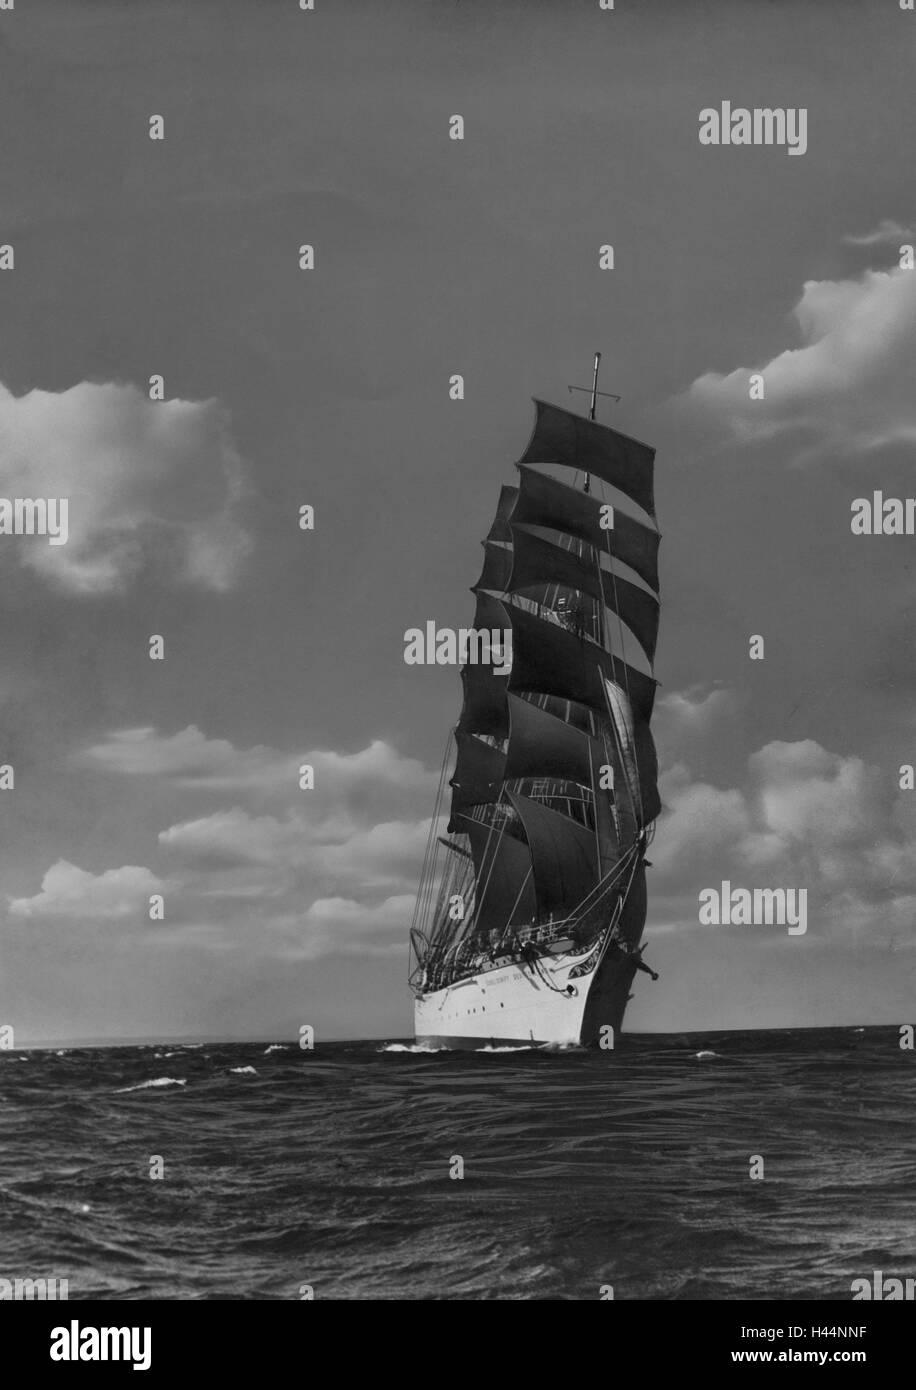 Sea, 'school ship Germany', journey, b/w, navigation, sailing ship, sail school ship, great yachtsman, full - Stock Image